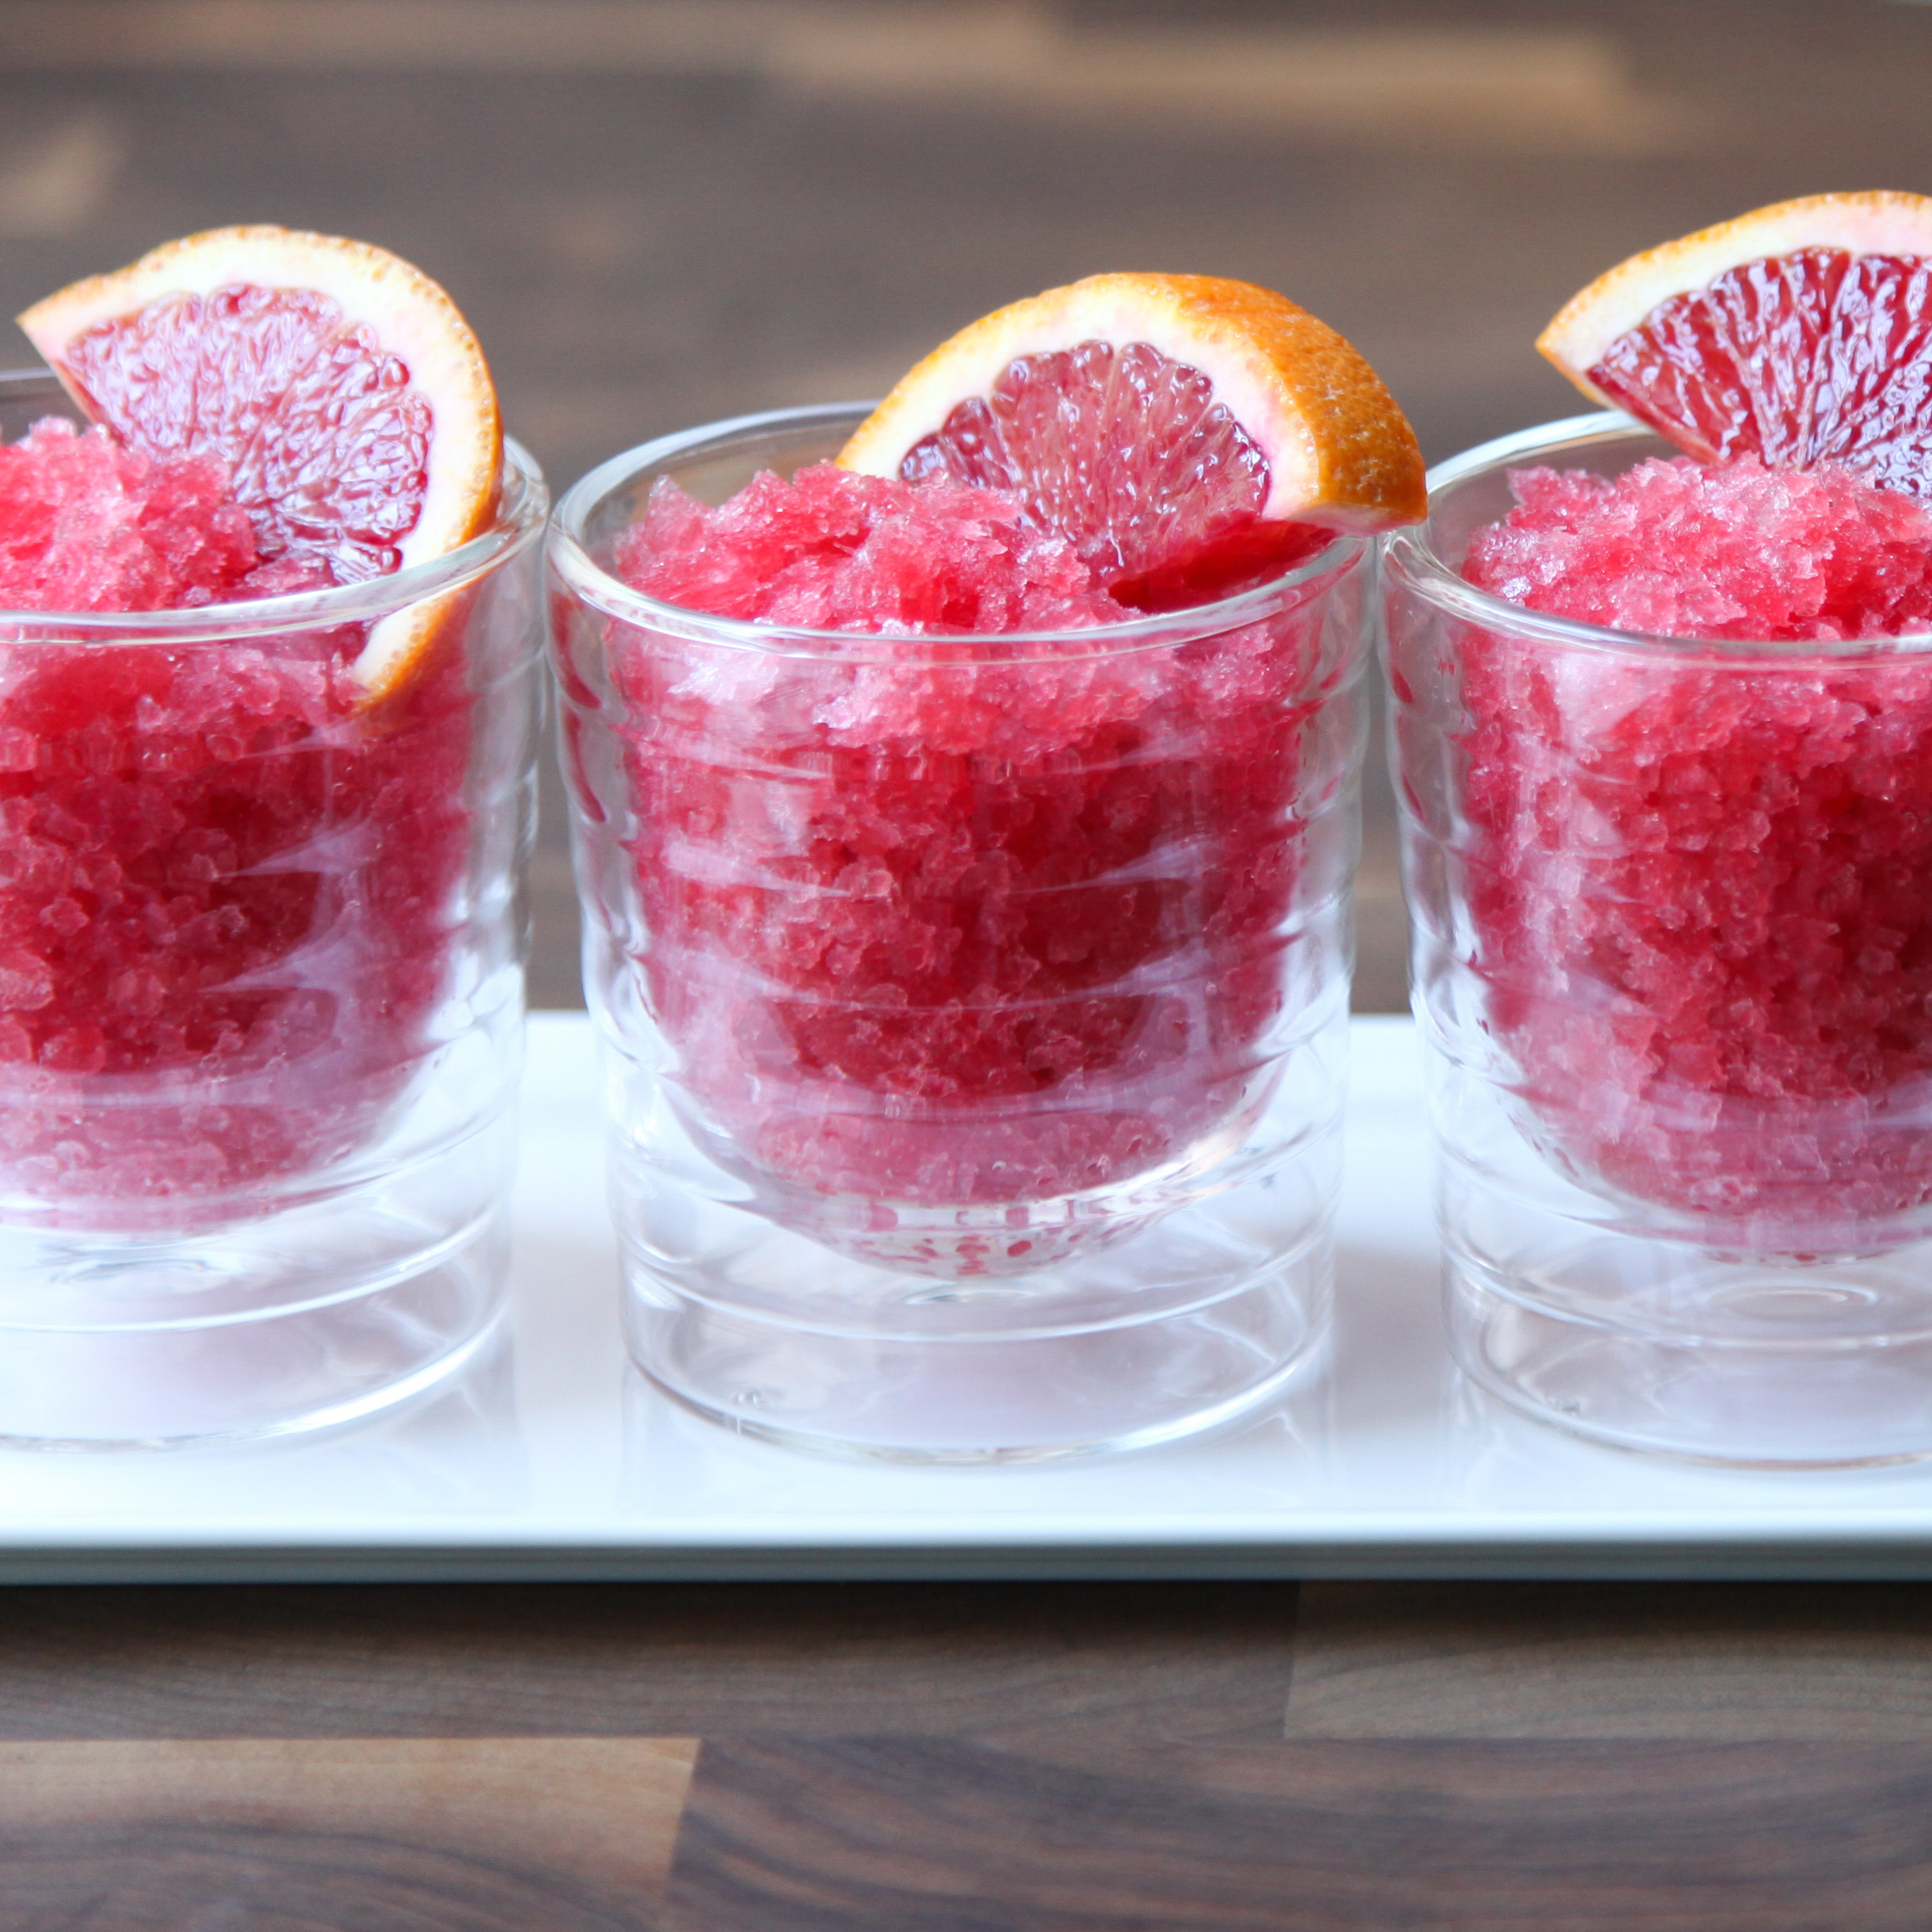 Blood Orange Aperol Granita | amodestfeast.com | A Modest Feast